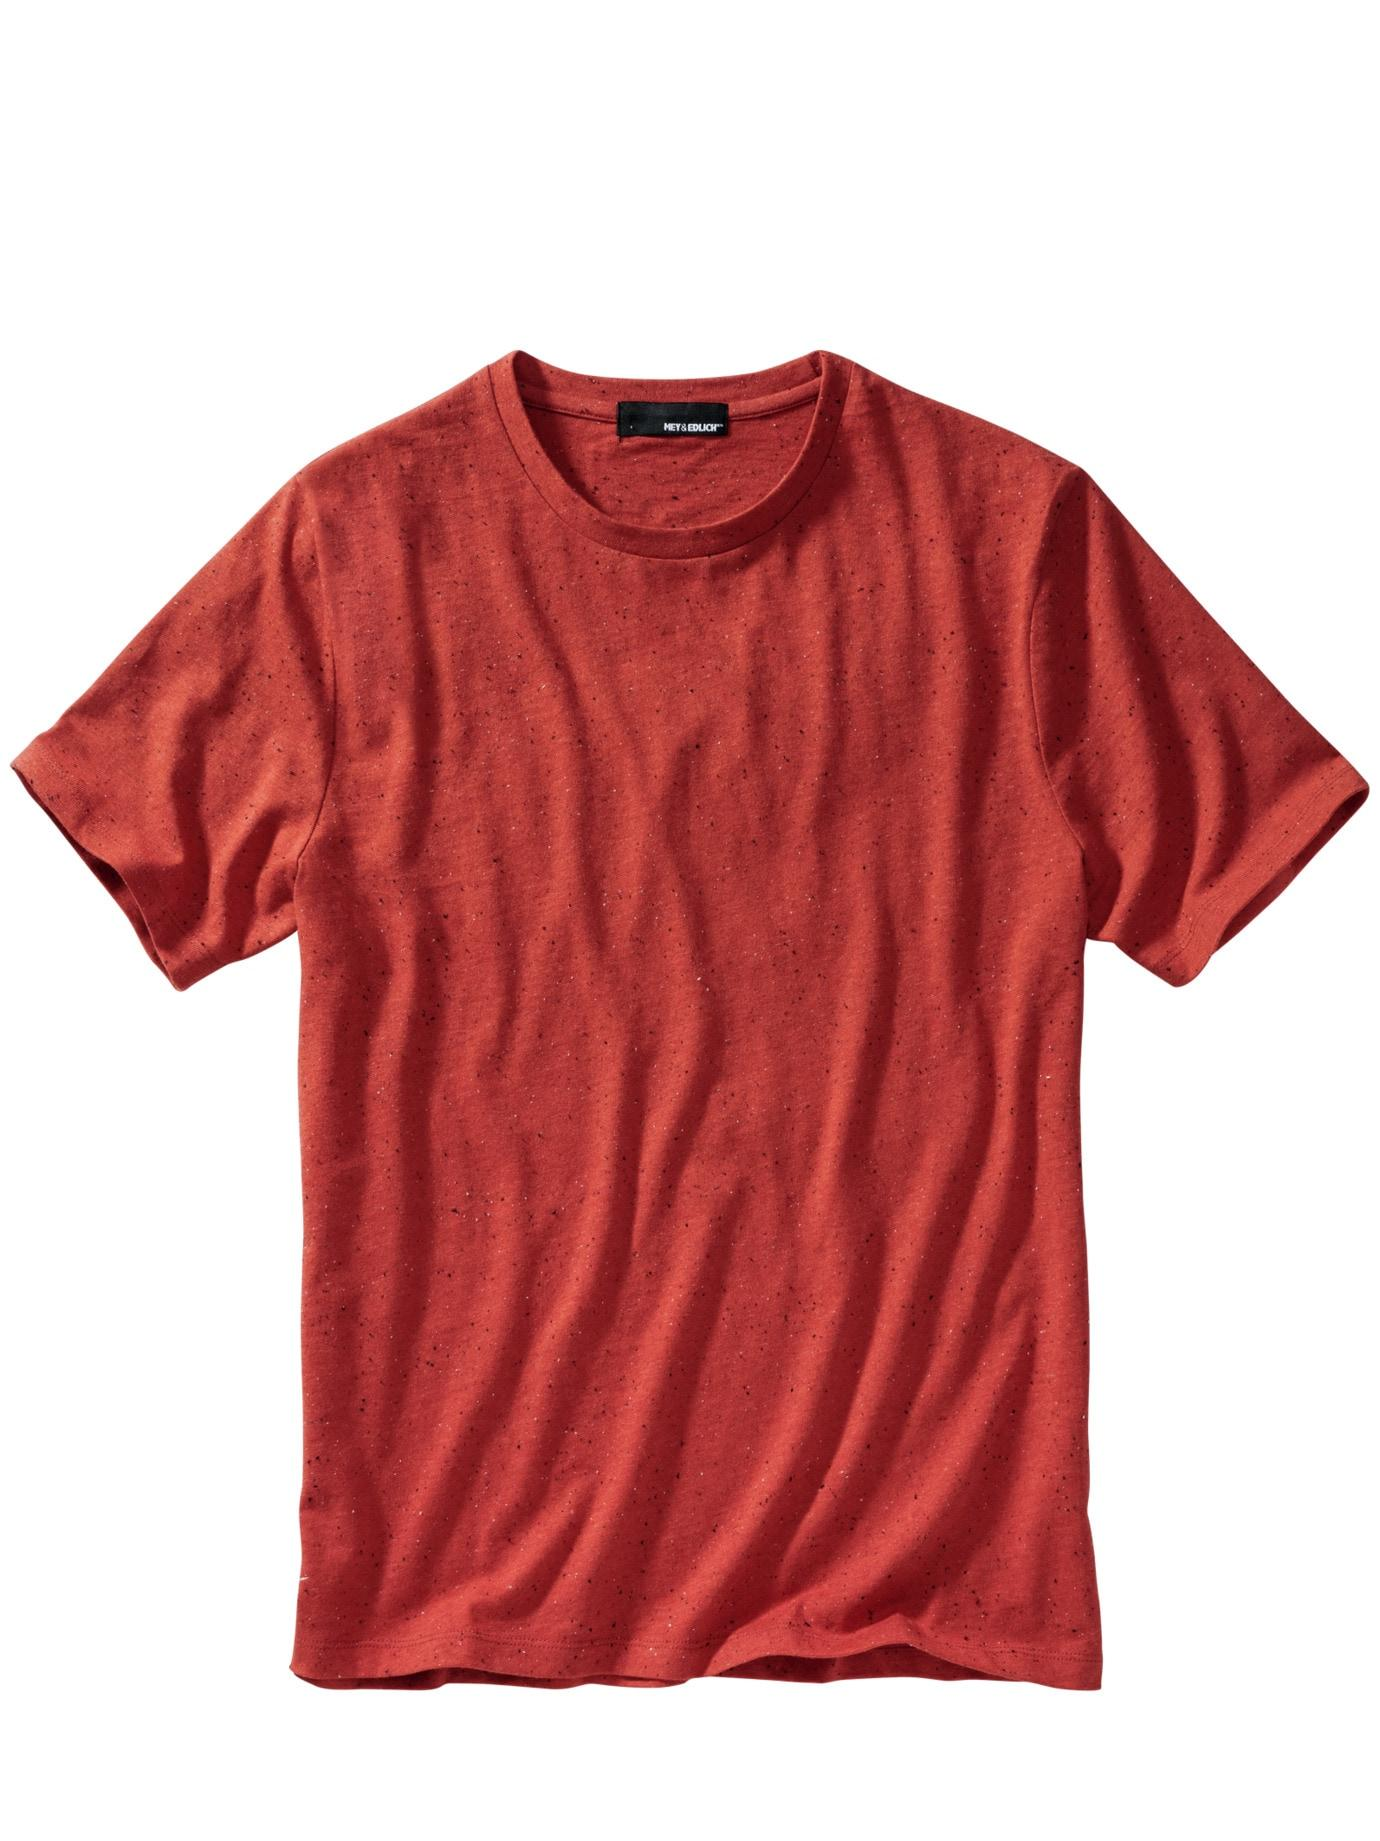 Herren Backstein-Shirt rot 46, 48, 50, 52, 54, 56